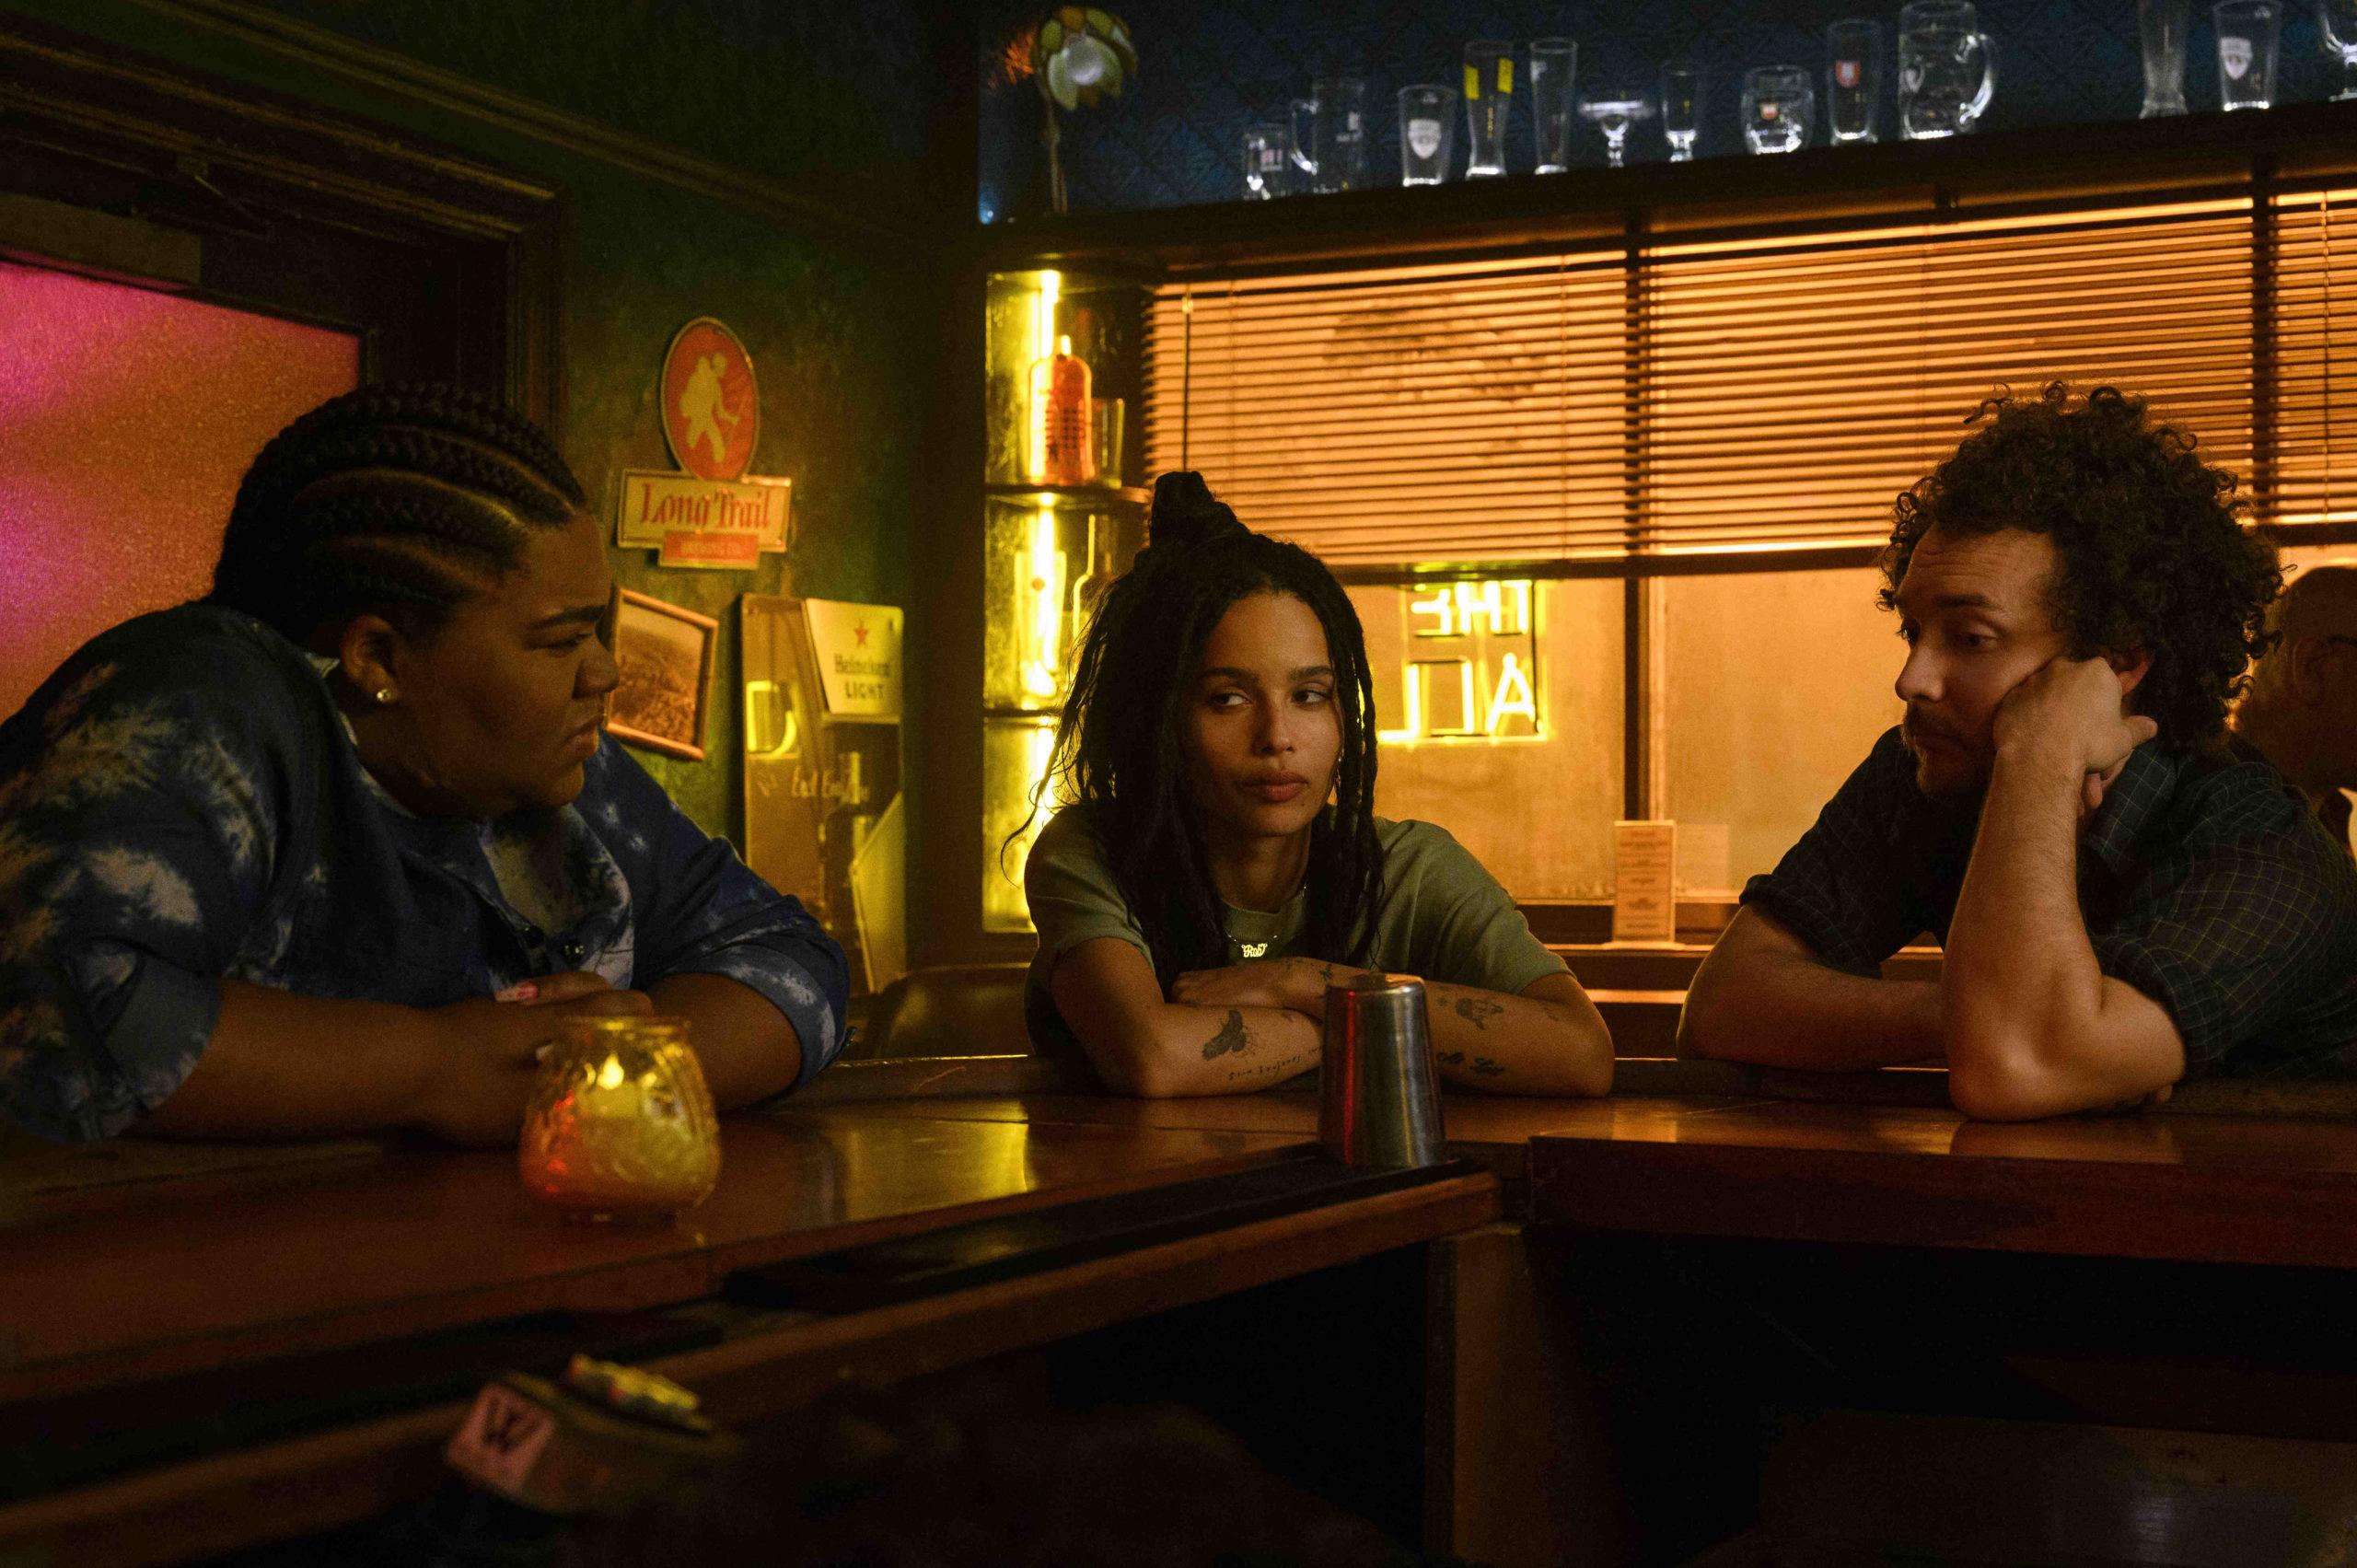 Da'Vine Joy Randolph, Zoë' Kravitz and David H. Holmes in 'High Fidelity'